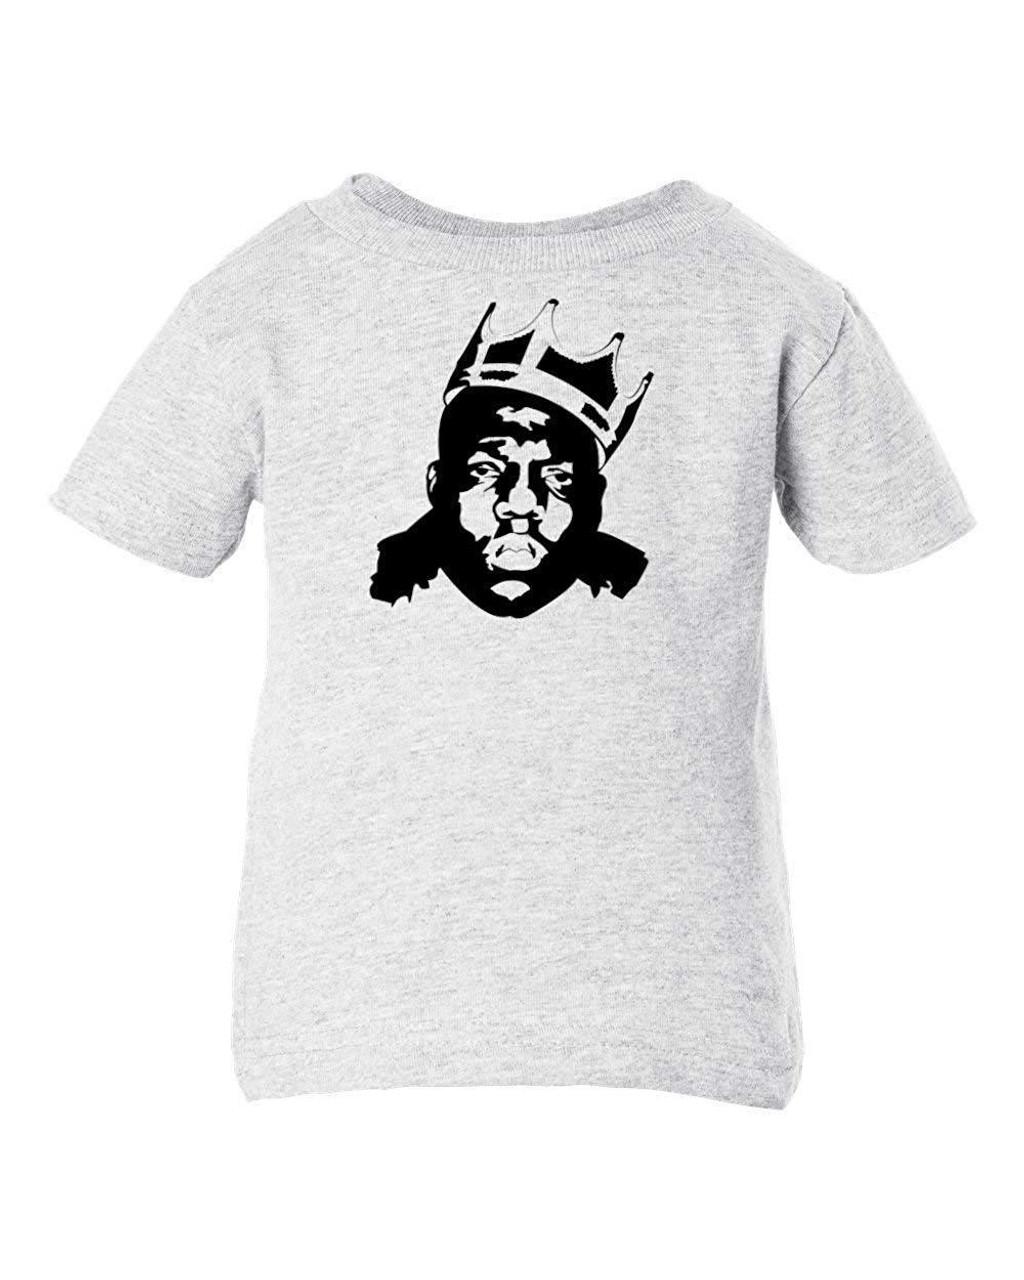 Biggie Smalls Notorious Big Rap Music Baby Infant & Toddler T-Shirt Ash Concert